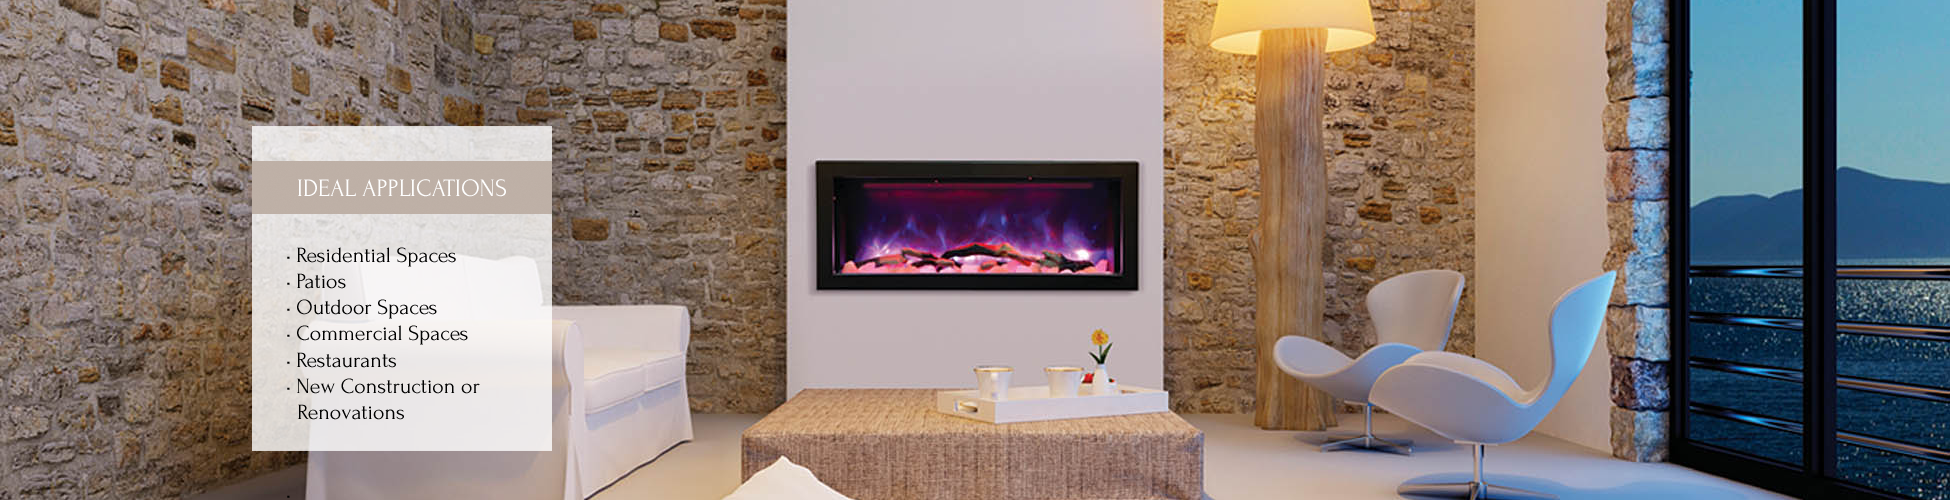 Panorama BI-40 electric fireplace